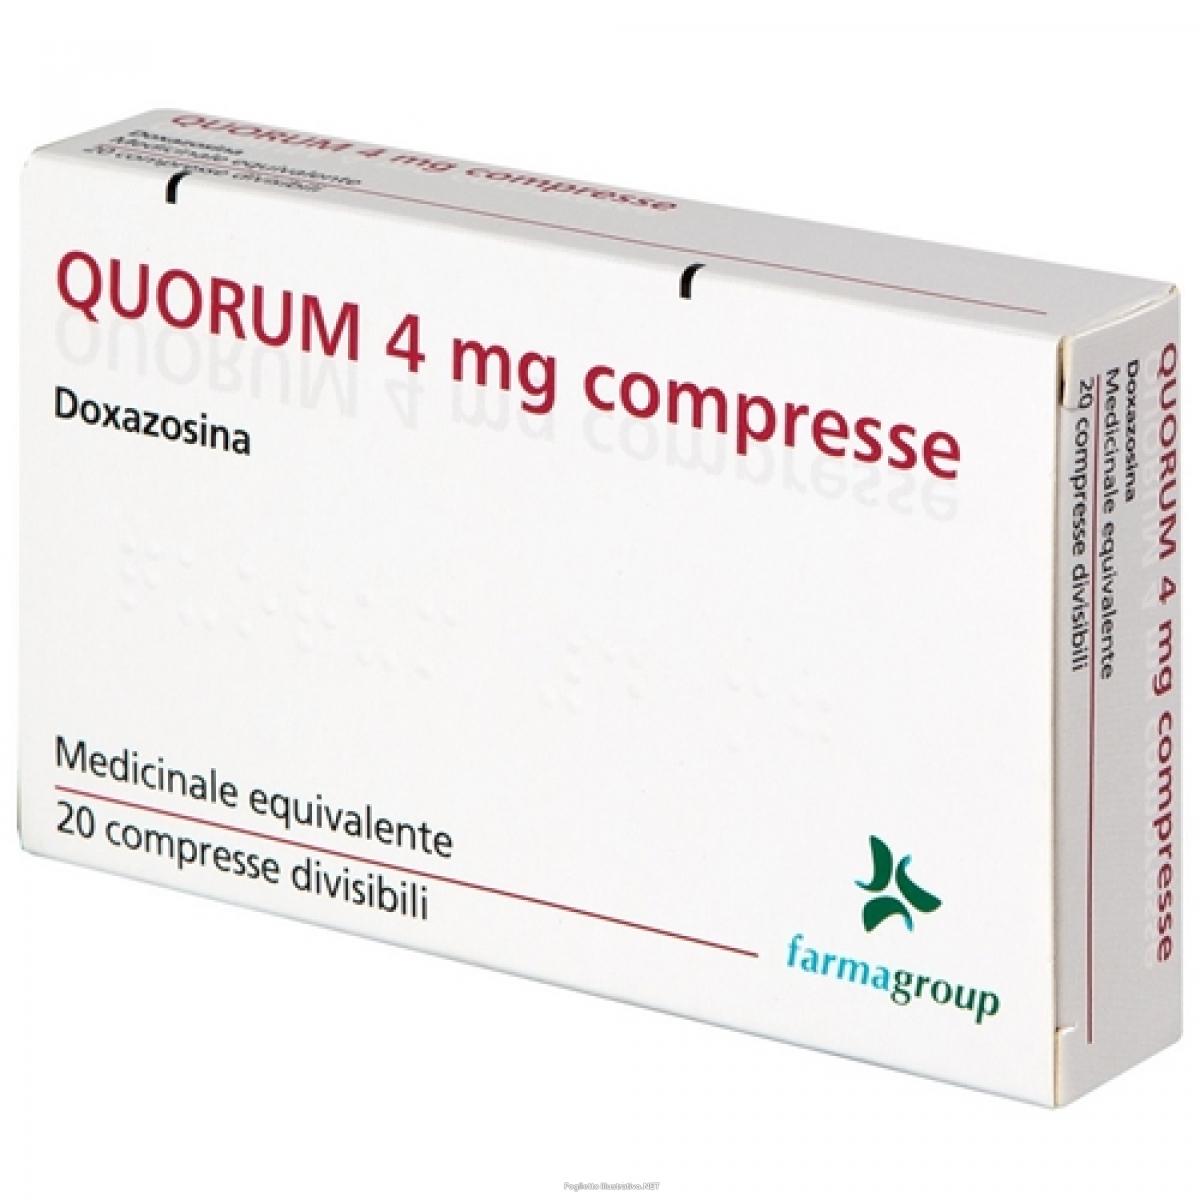 quorum 20 compresse div 4mg bugiardino cod: 037927023